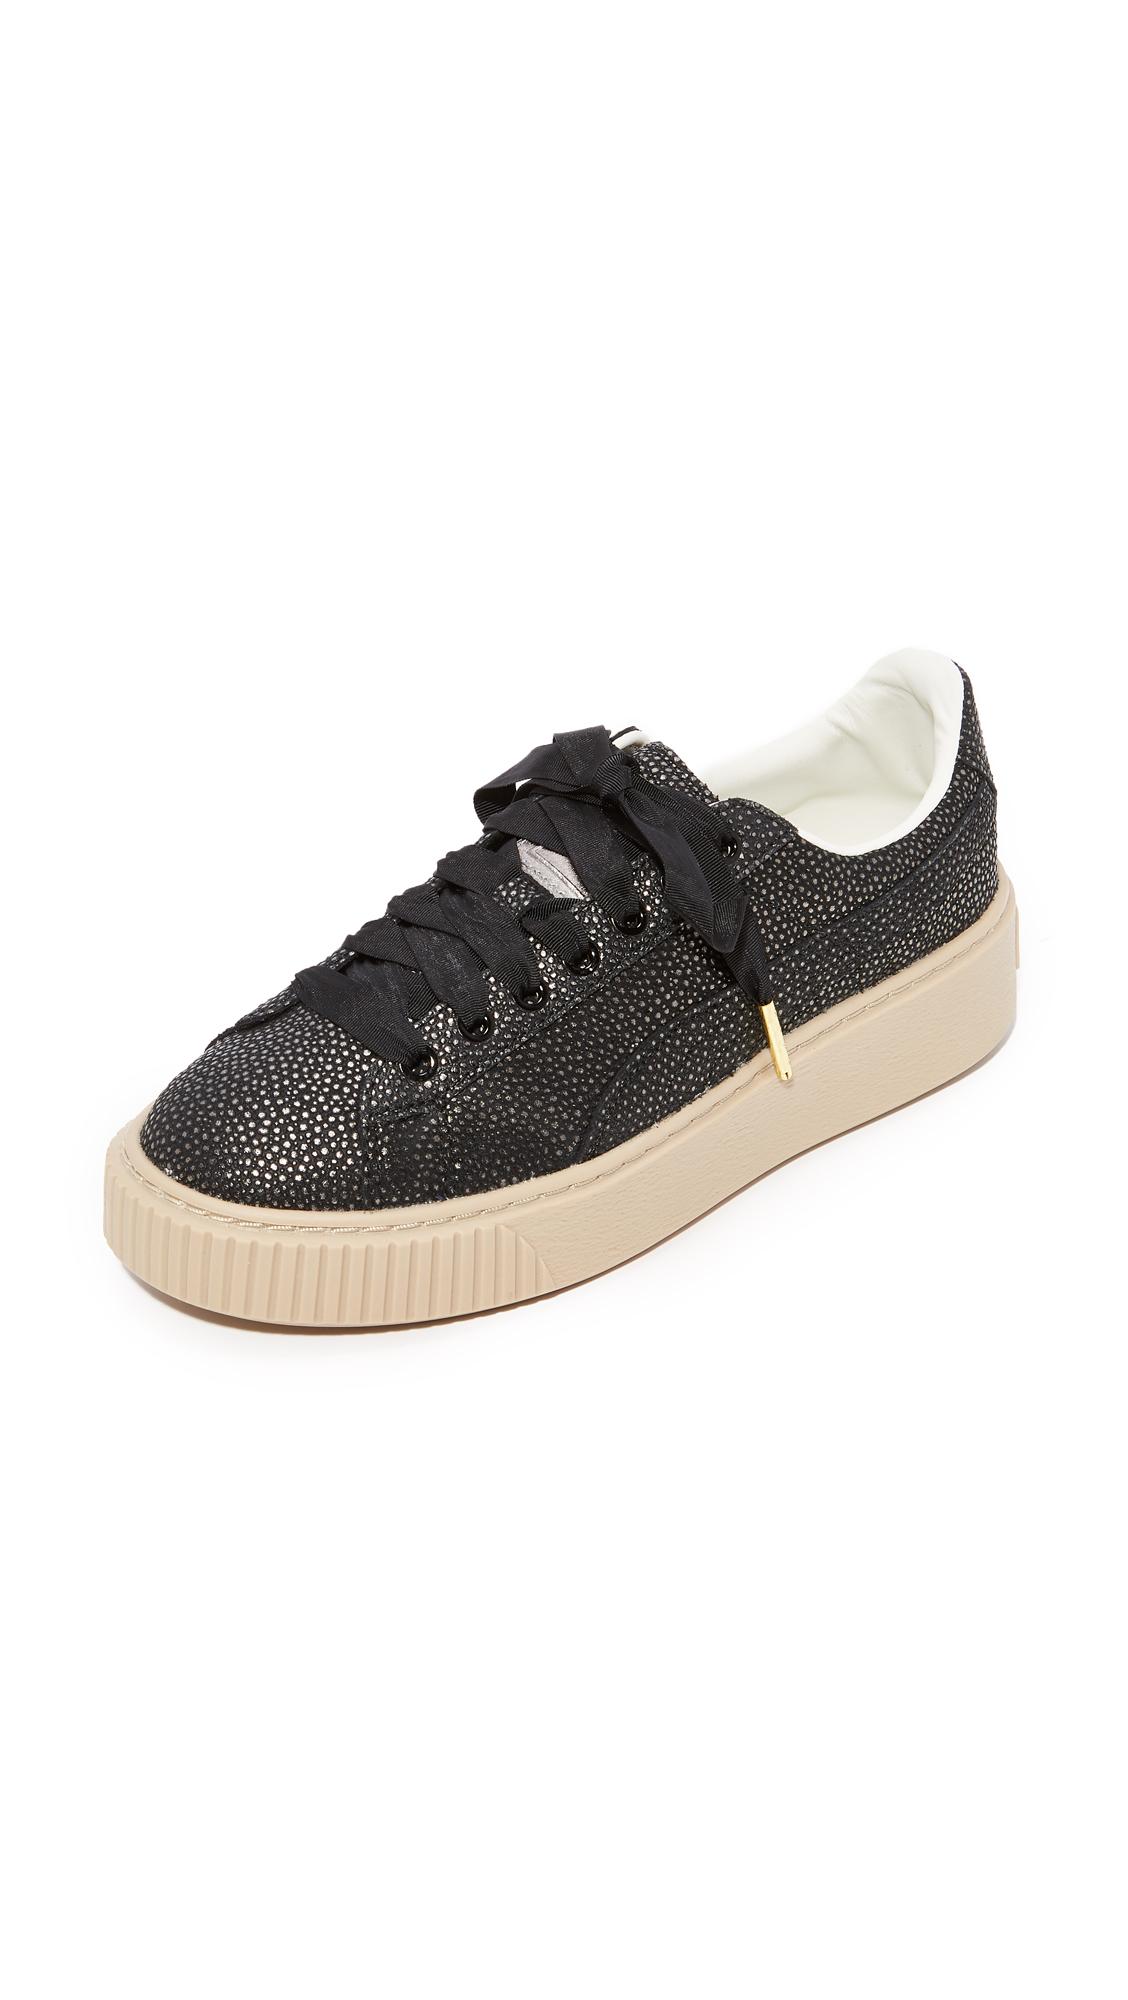 PUMA Basket Platform Lux Sneaker - Black